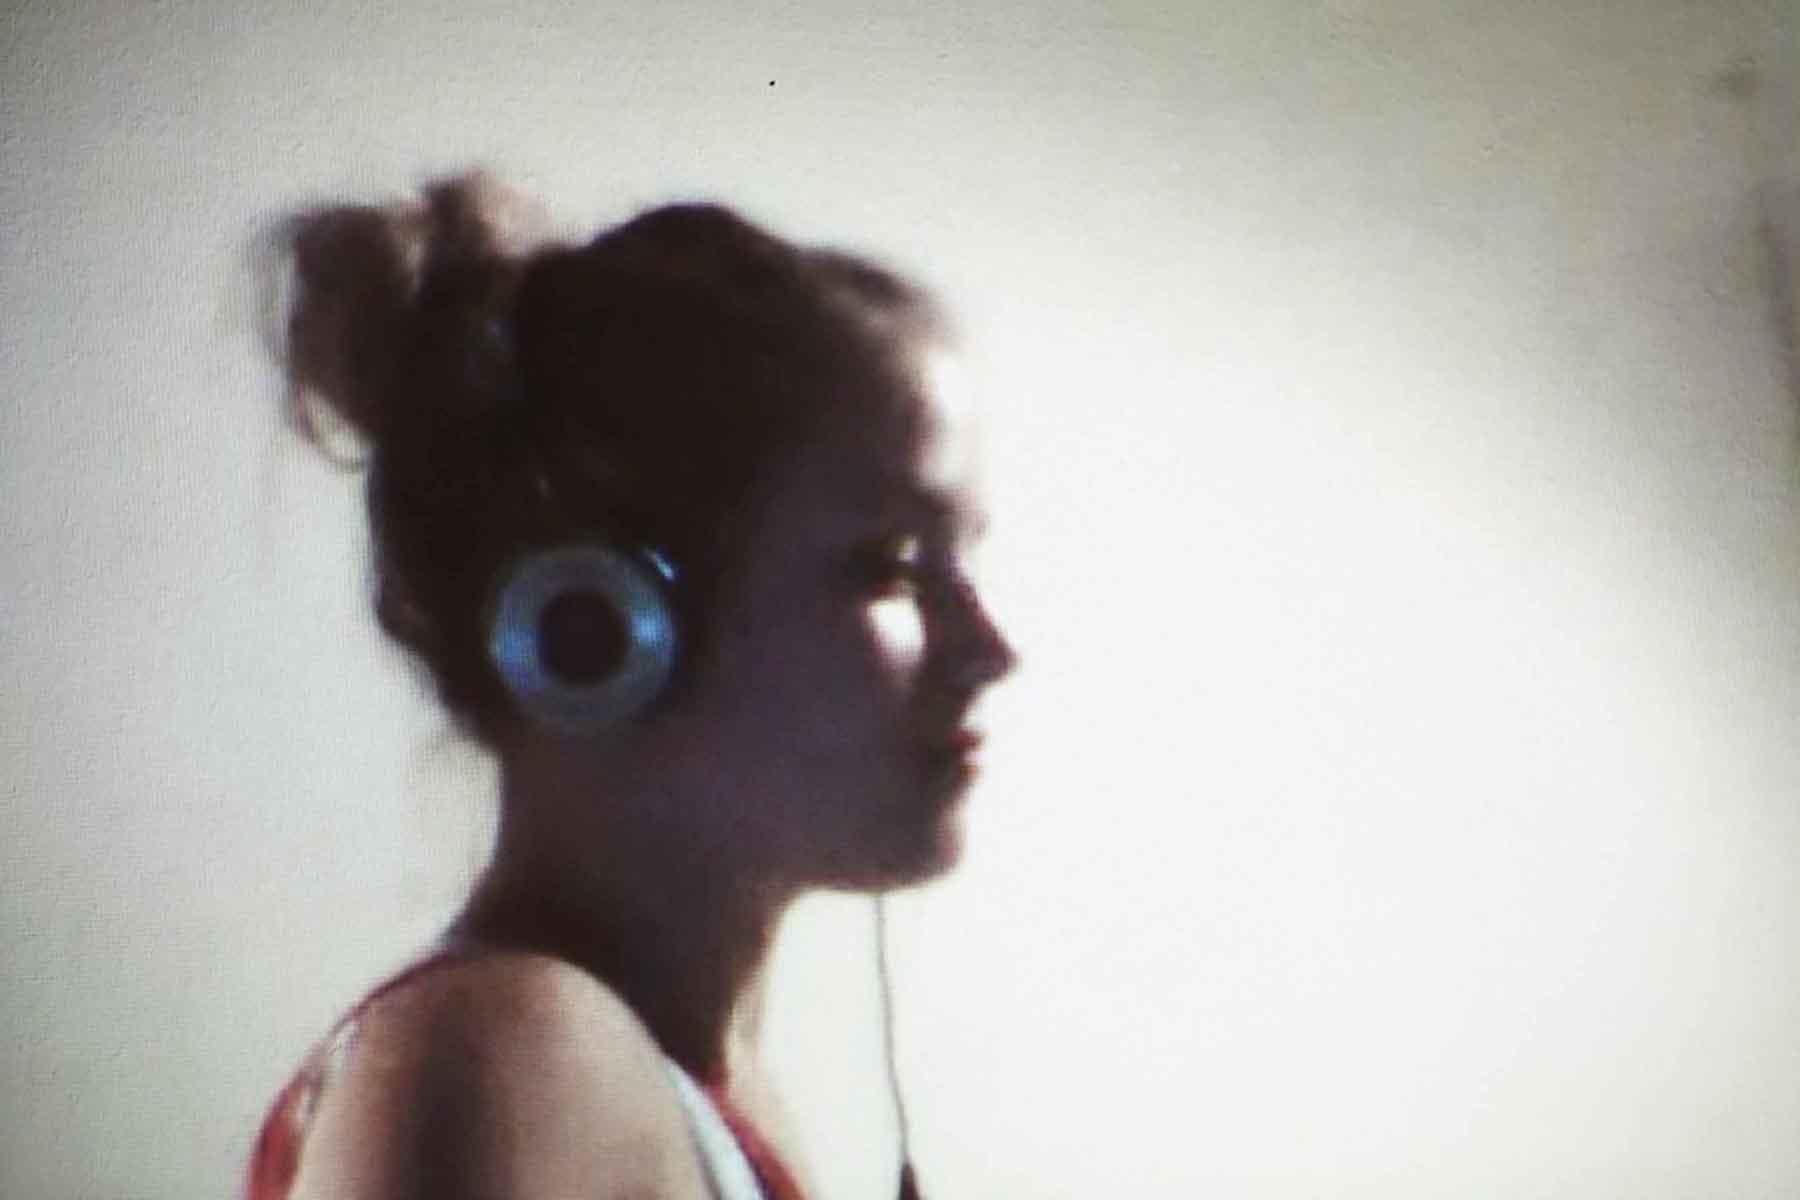 KATRIN, 25, DUESSELDORF, GERMANY